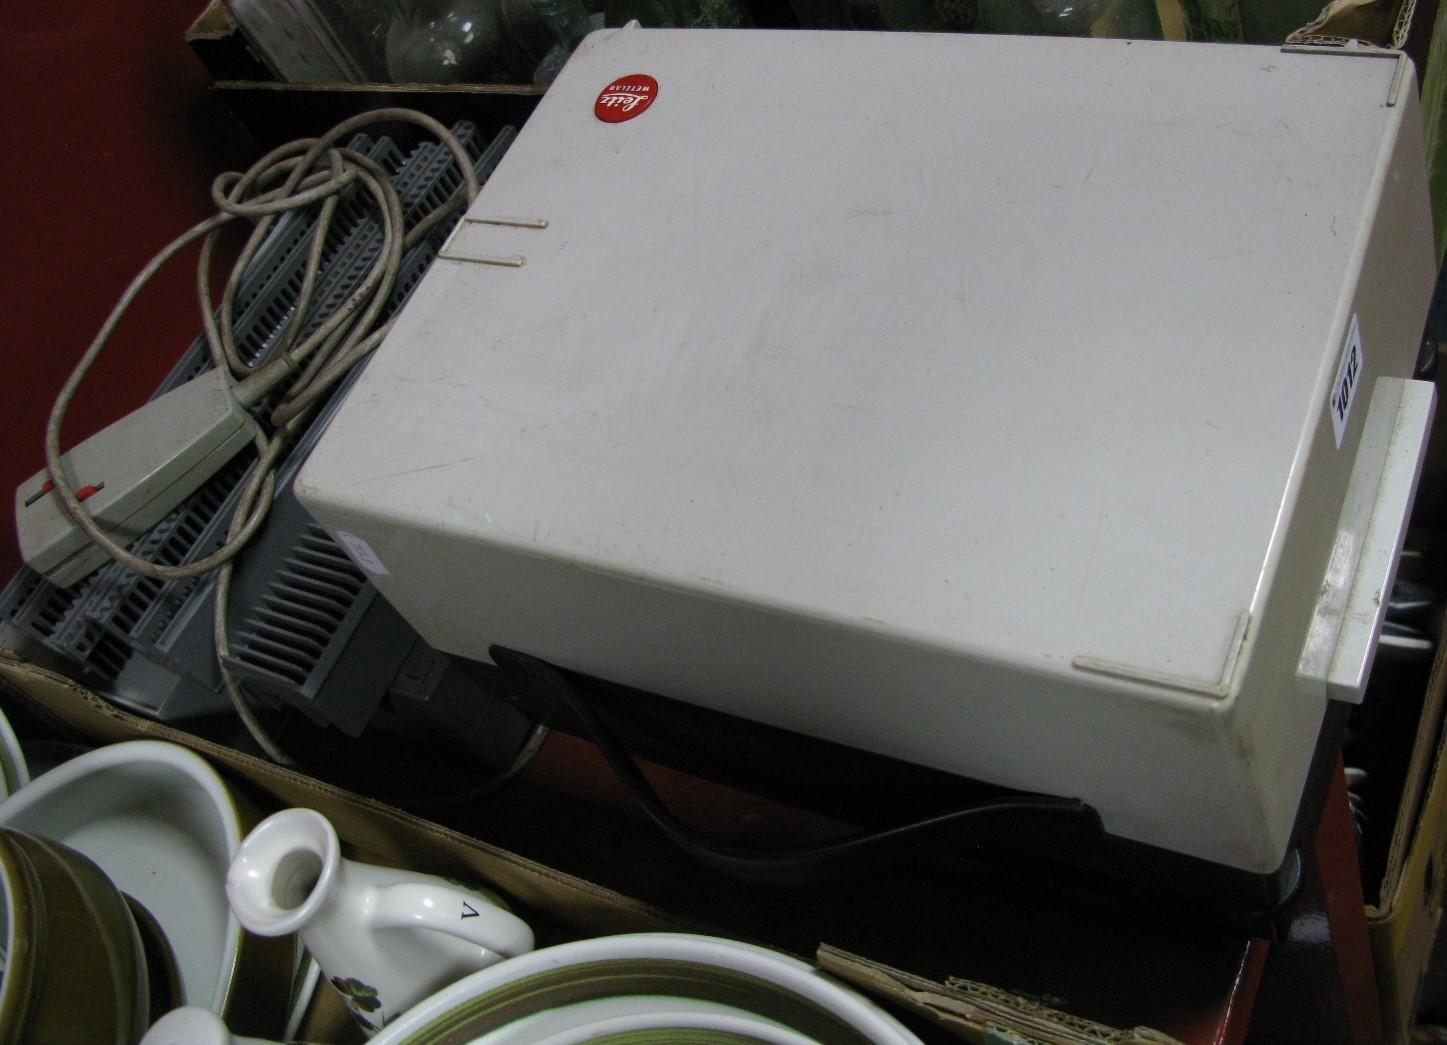 Lot 1012 - A Leitz (Leica) Slide projector, pradovit 250 with six magazine.